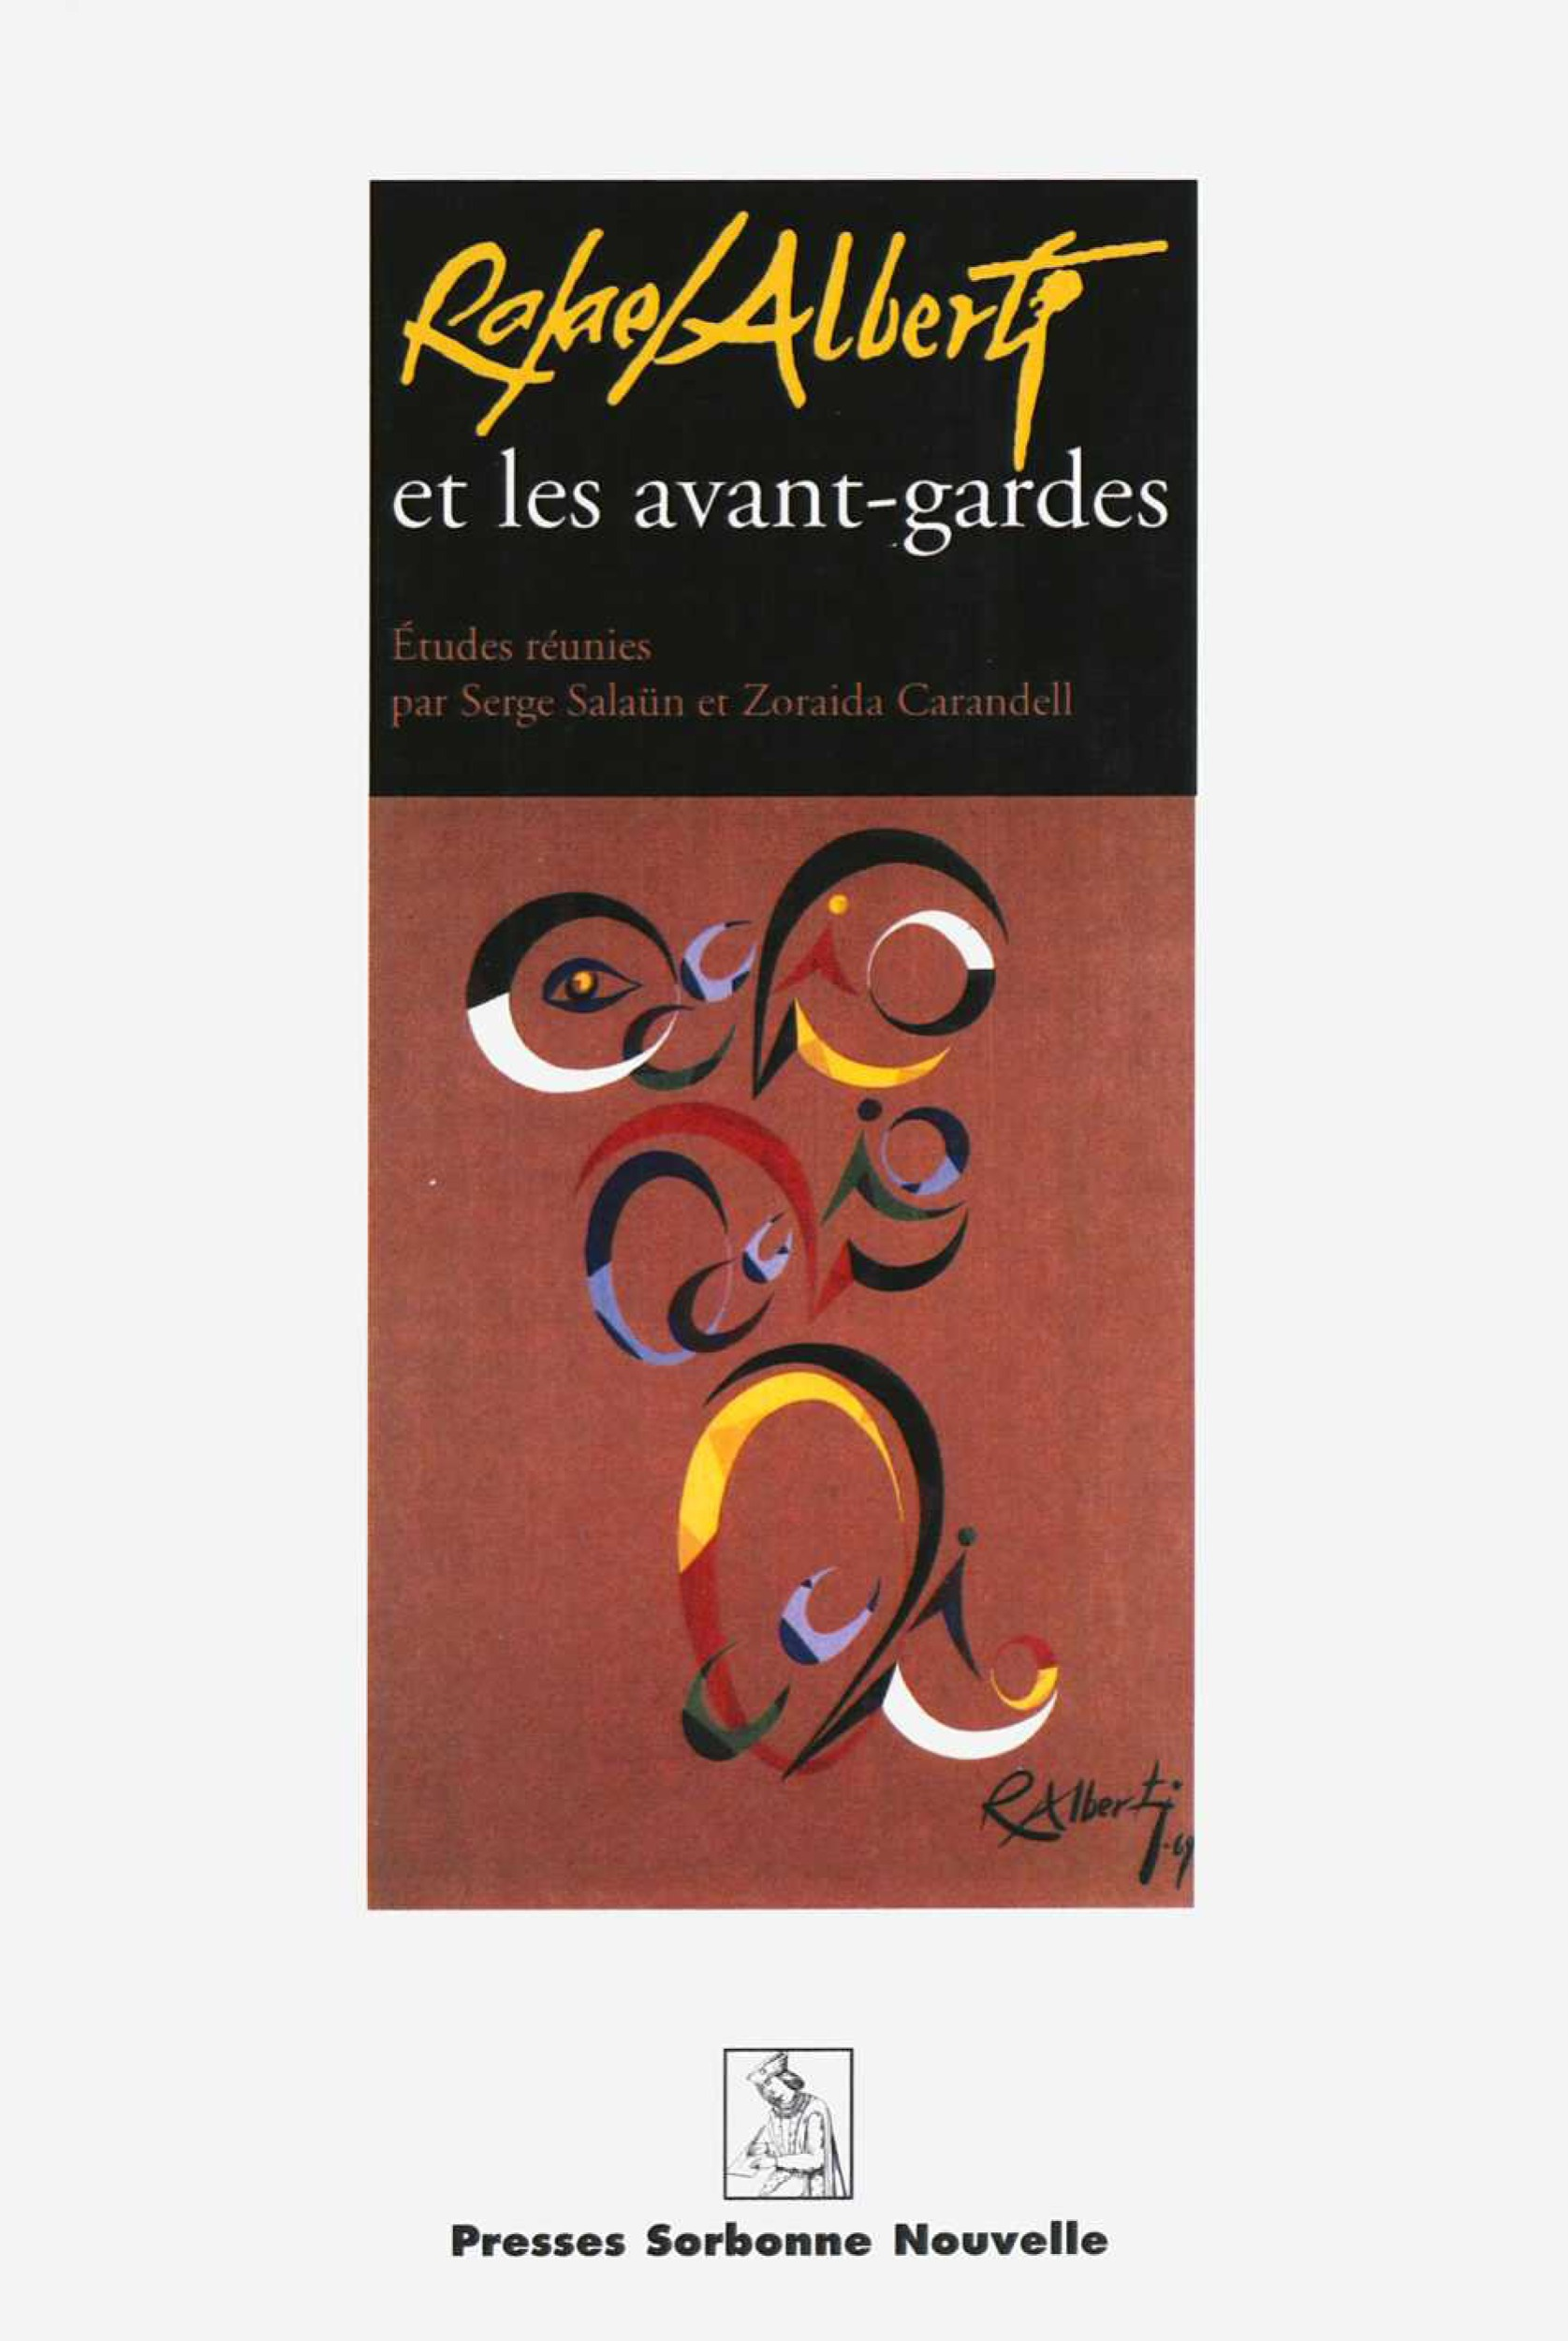 Rafael Alberti et les avant-gardes